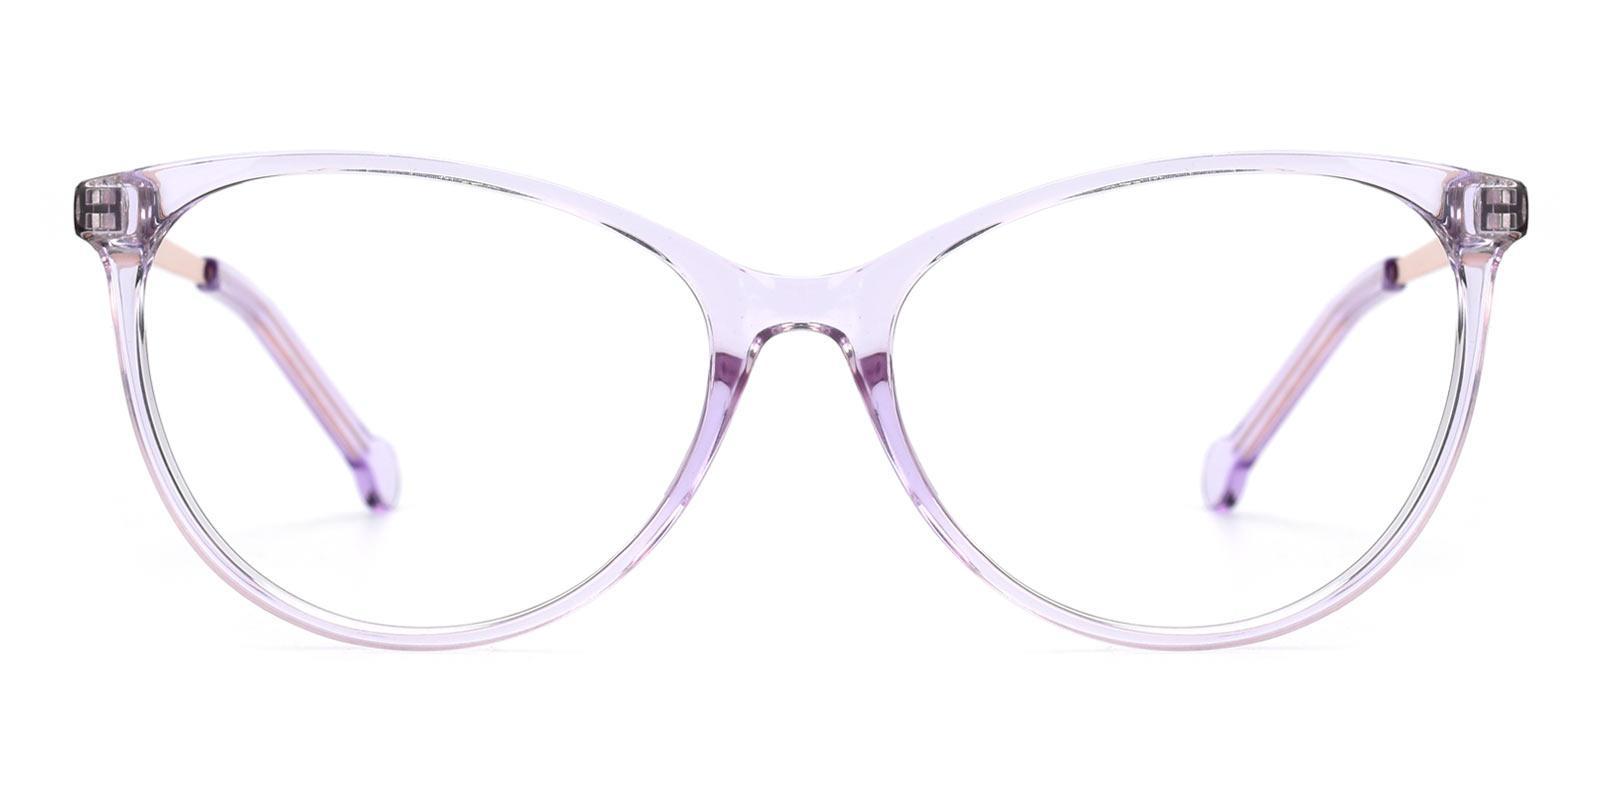 Wisteria-Purple-Cat-Acetate-Eyeglasses-detail